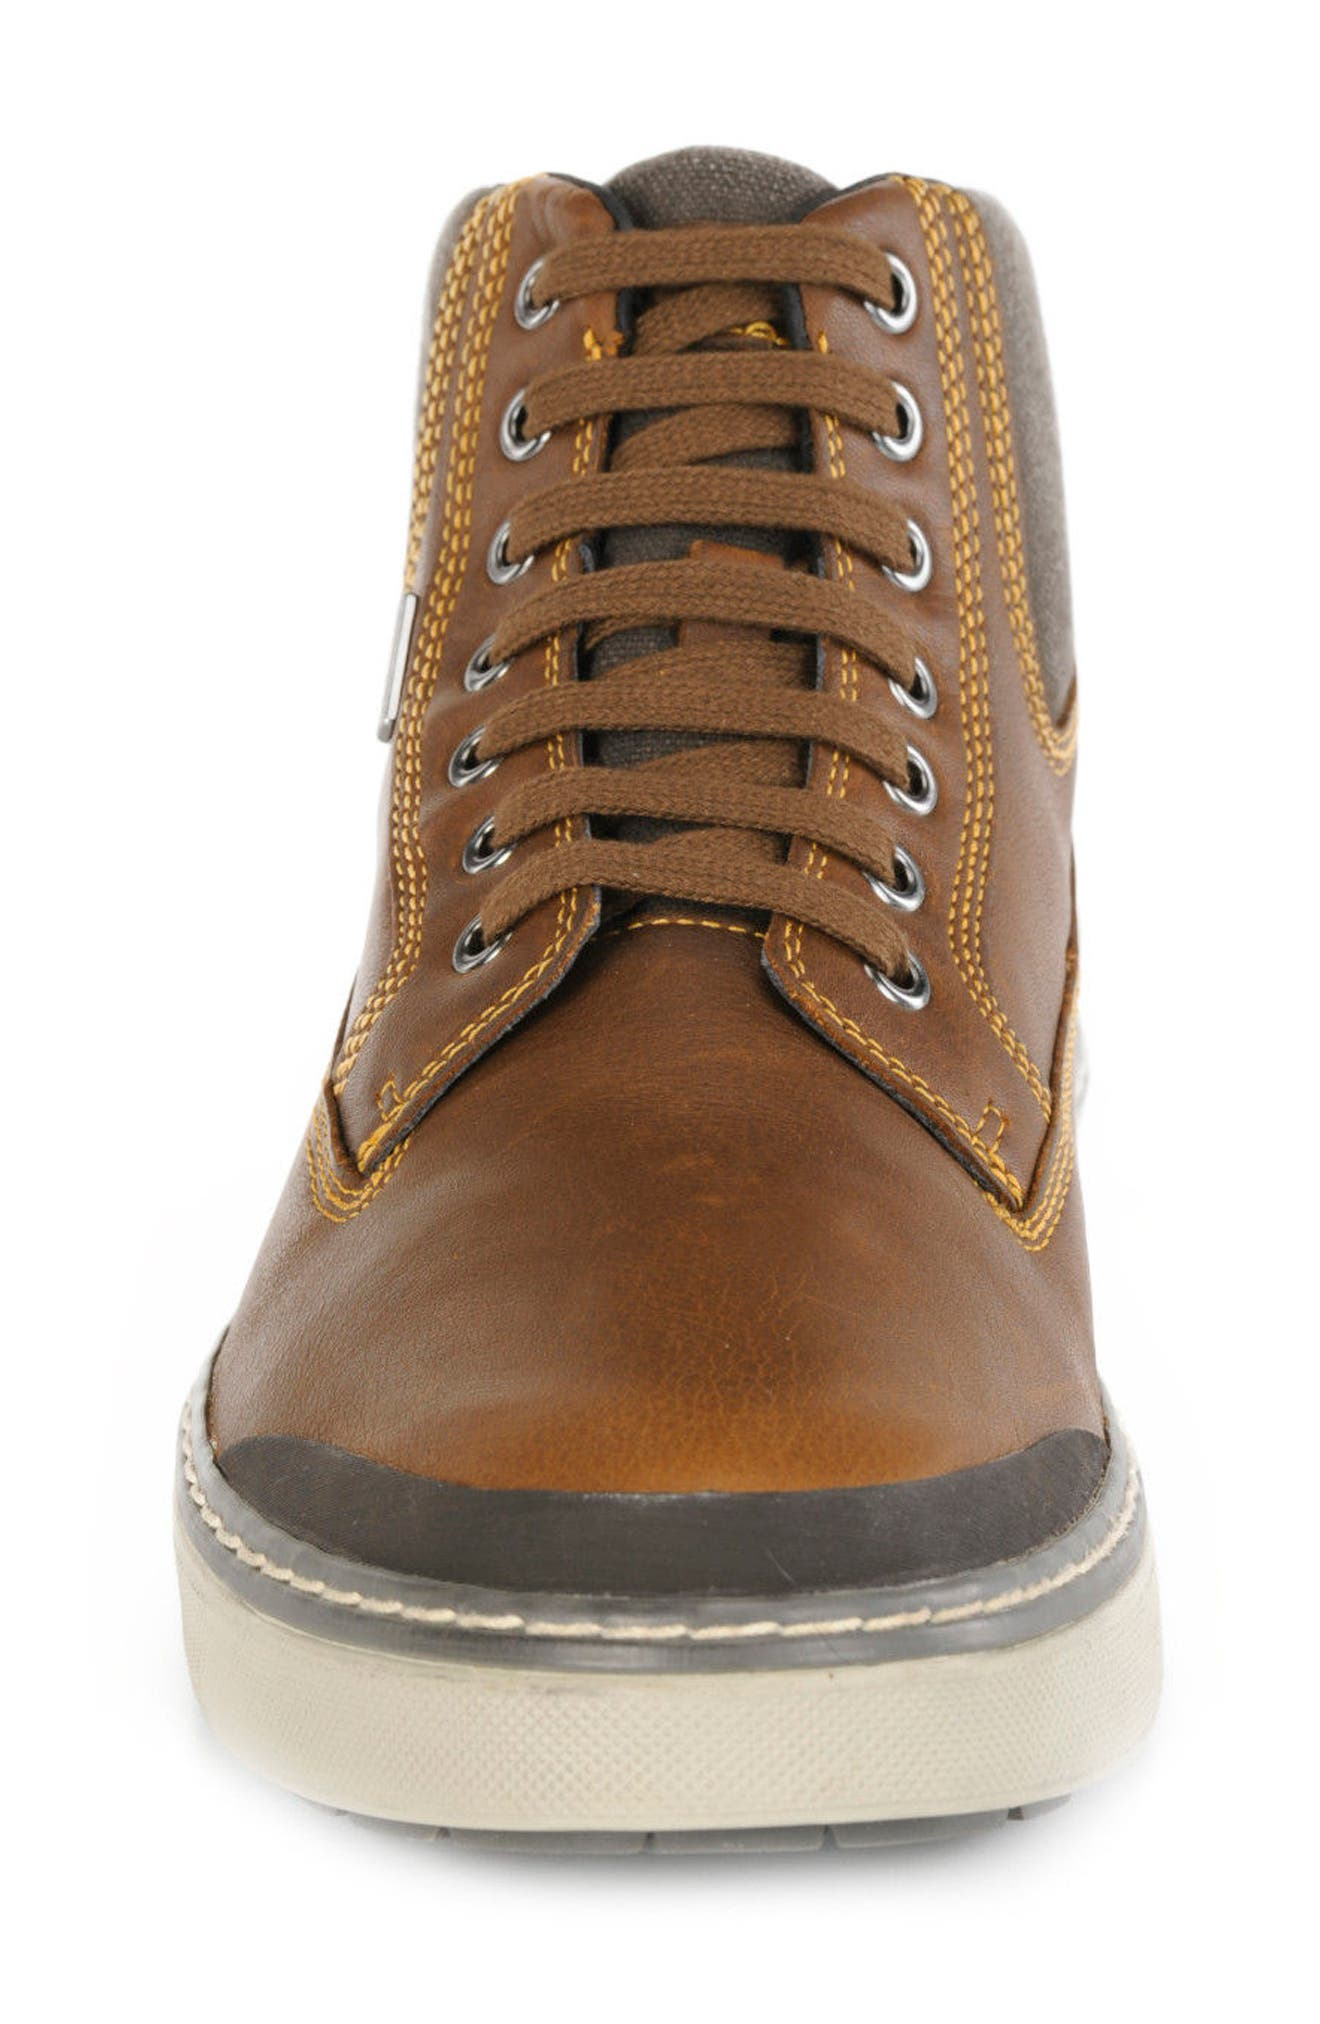 Mattias Amphibiox Waterproof Leather Sneaker,                             Alternate thumbnail 4, color,                             204